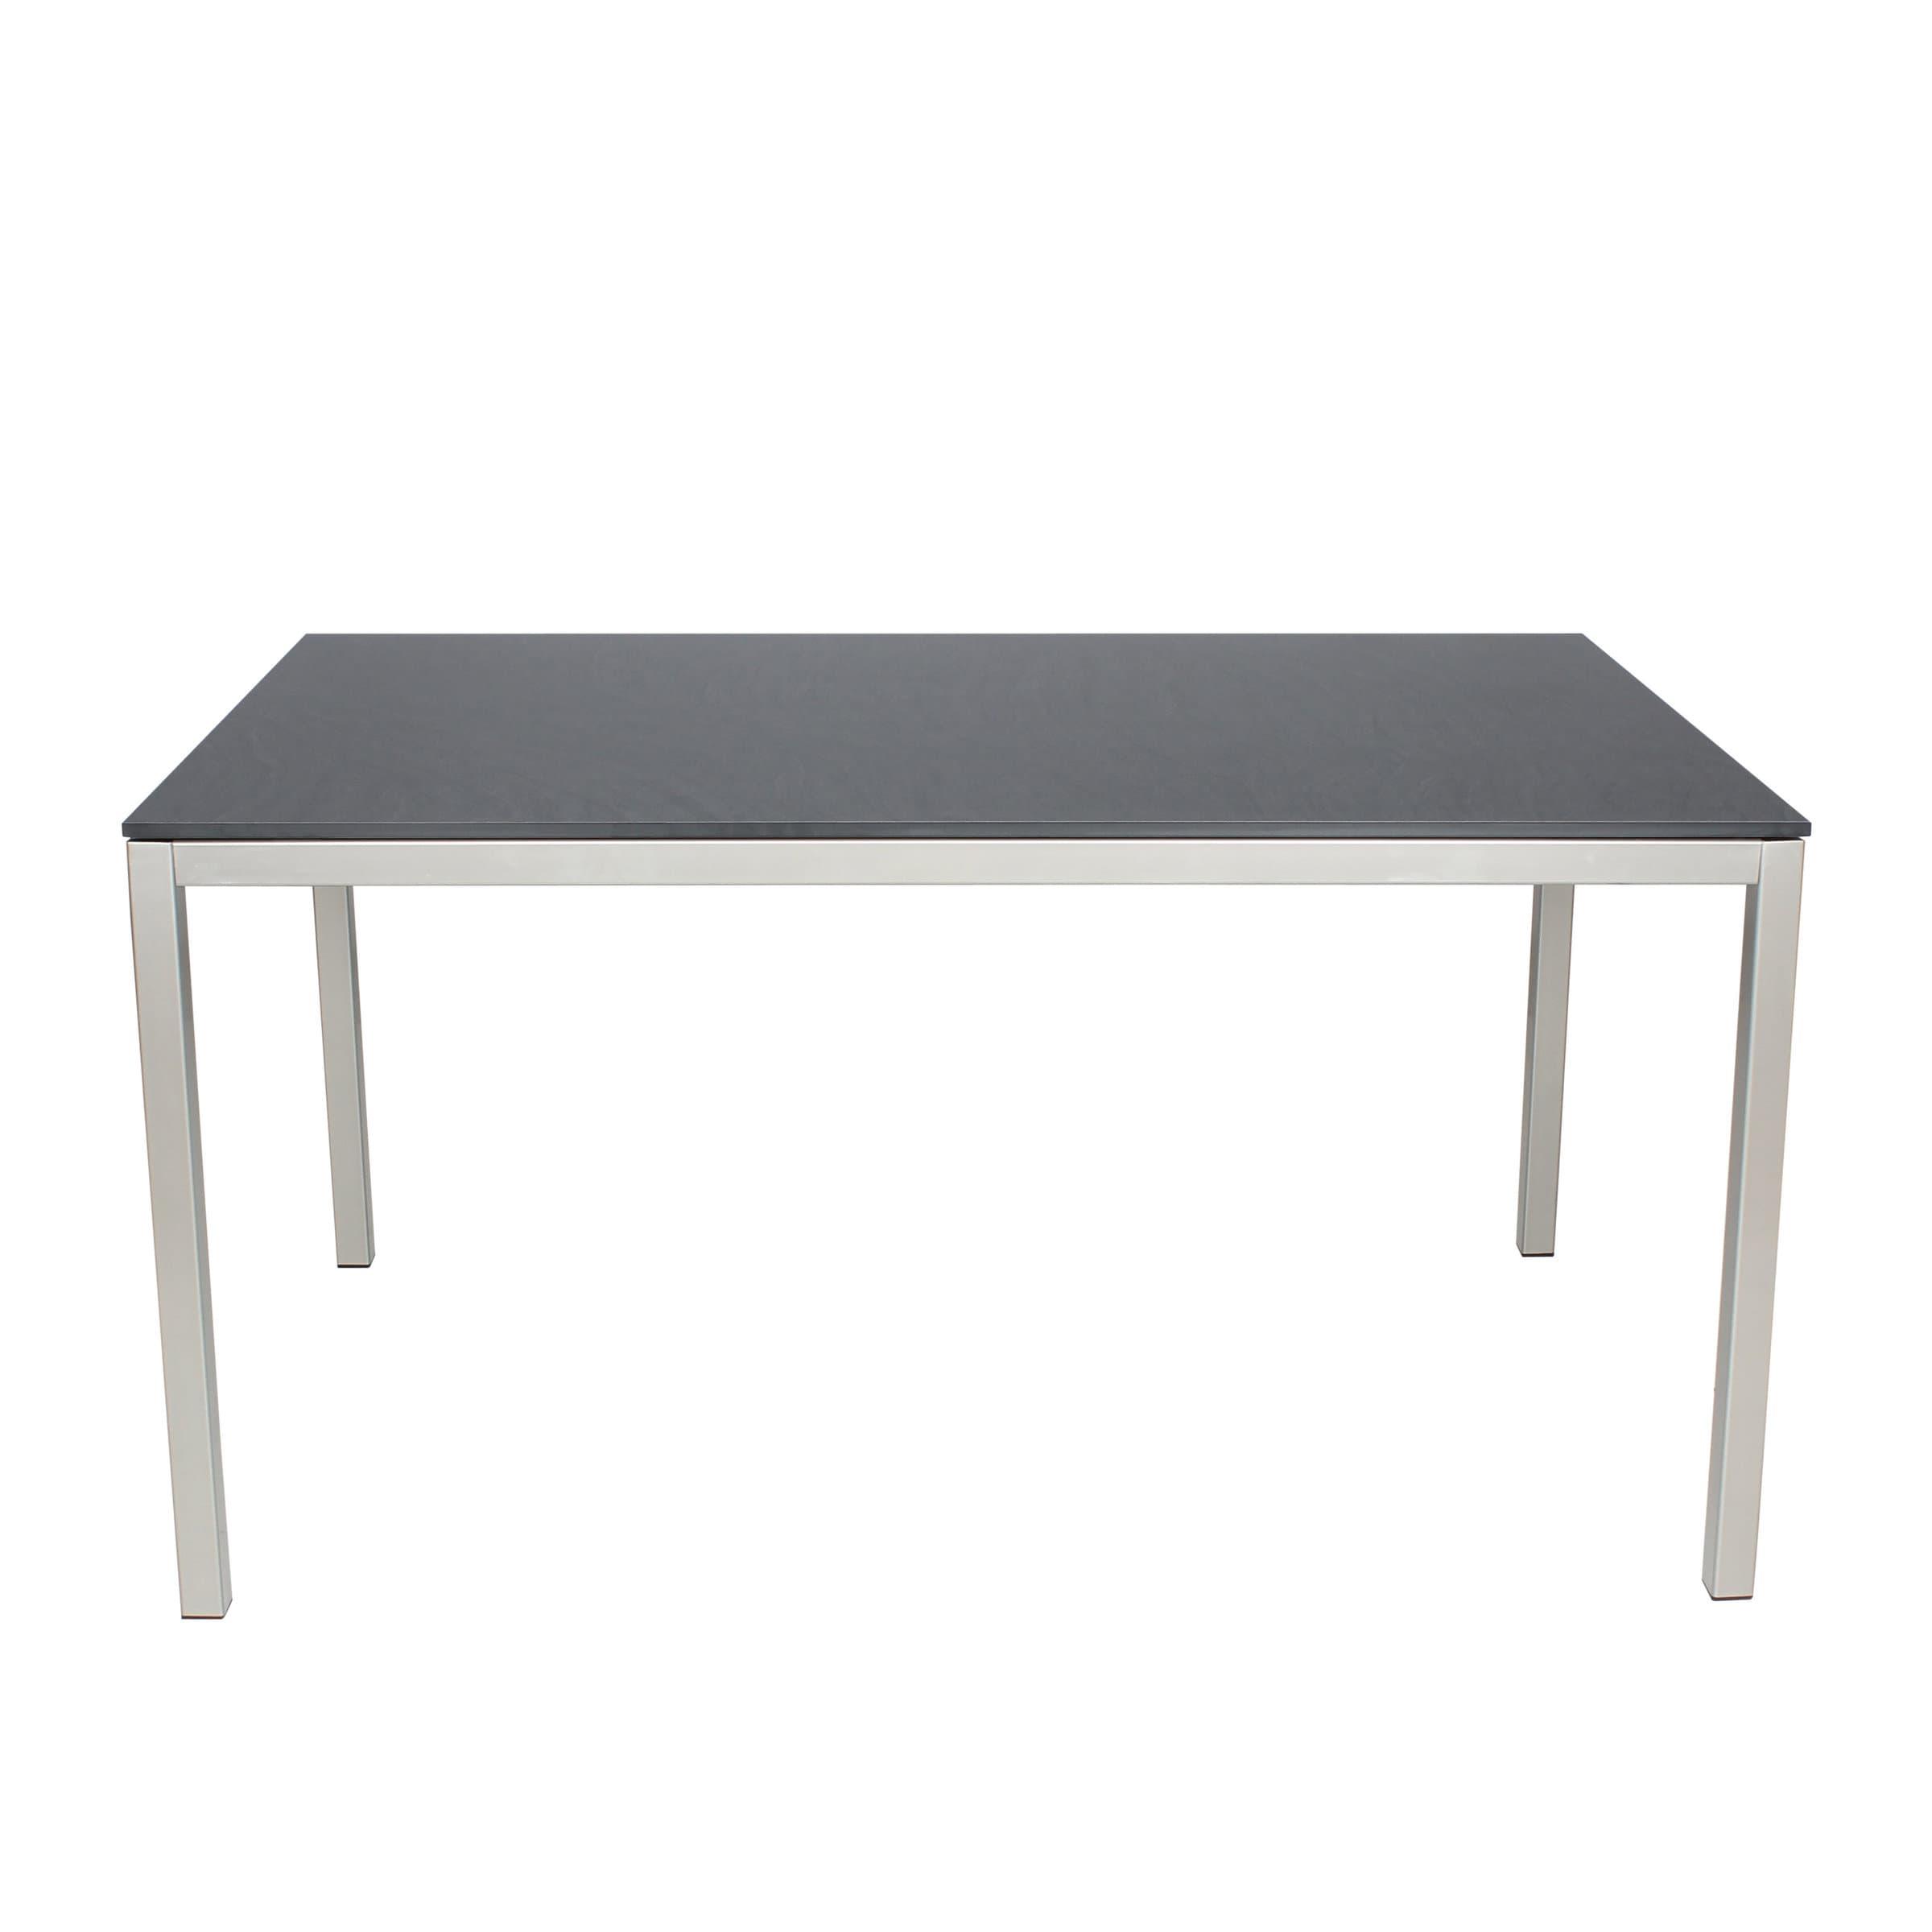 Table locarno avec plateau hpl dark grey 180 cm migros for Plateau table 180